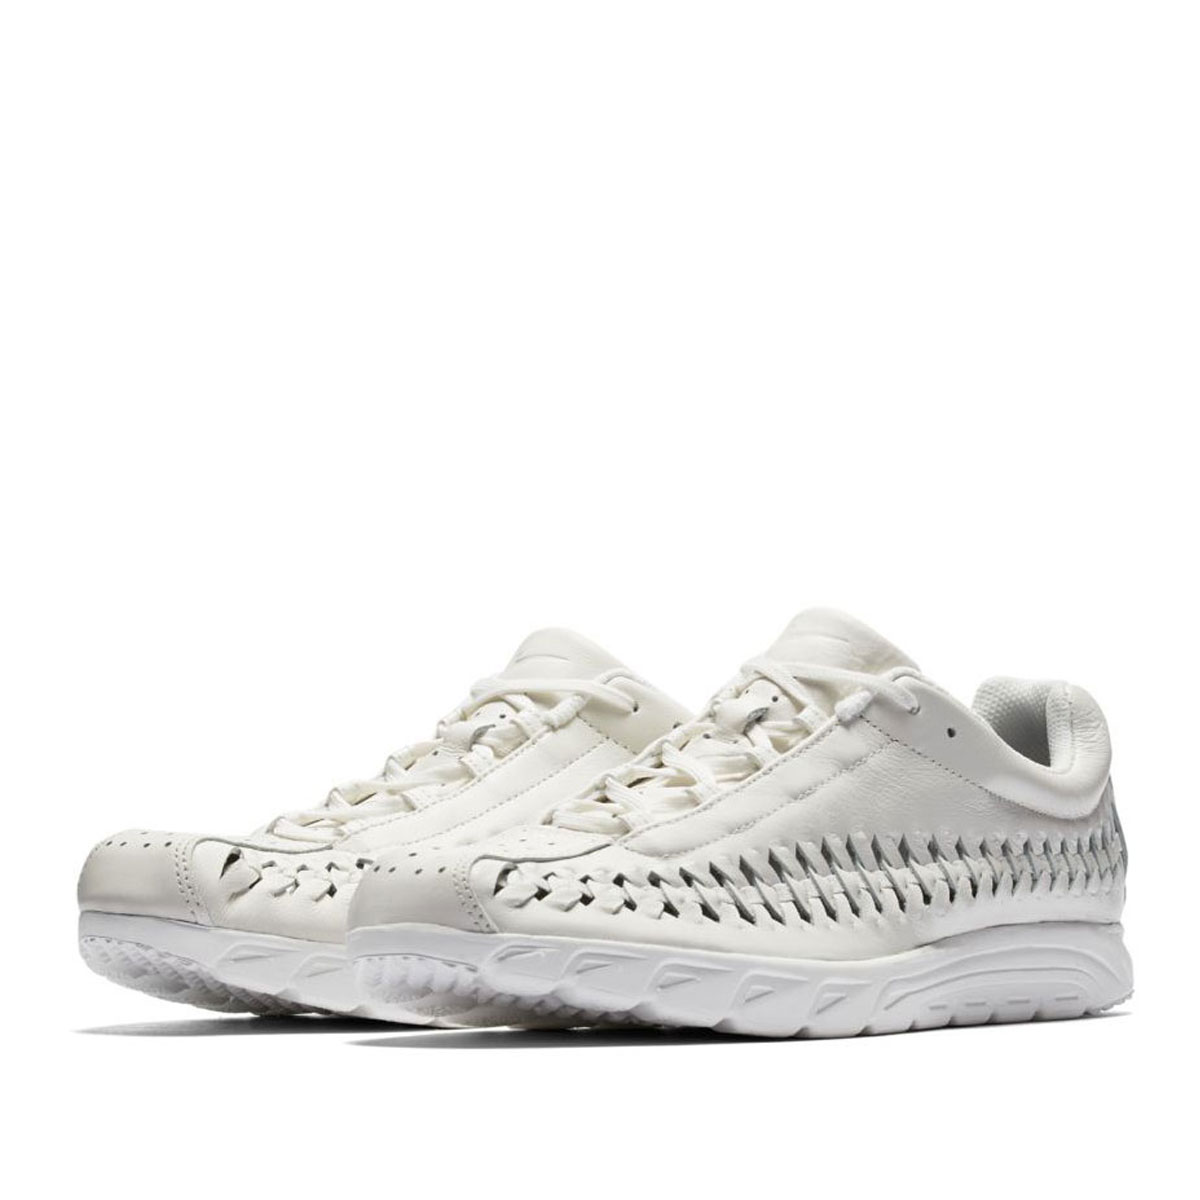 e9dc30e24fe842 NIKE MAYFLY WOVEN (Nike May fly Woo) SUMMIT WHITE SUMMIT WHITE-BLACK 17FA-I